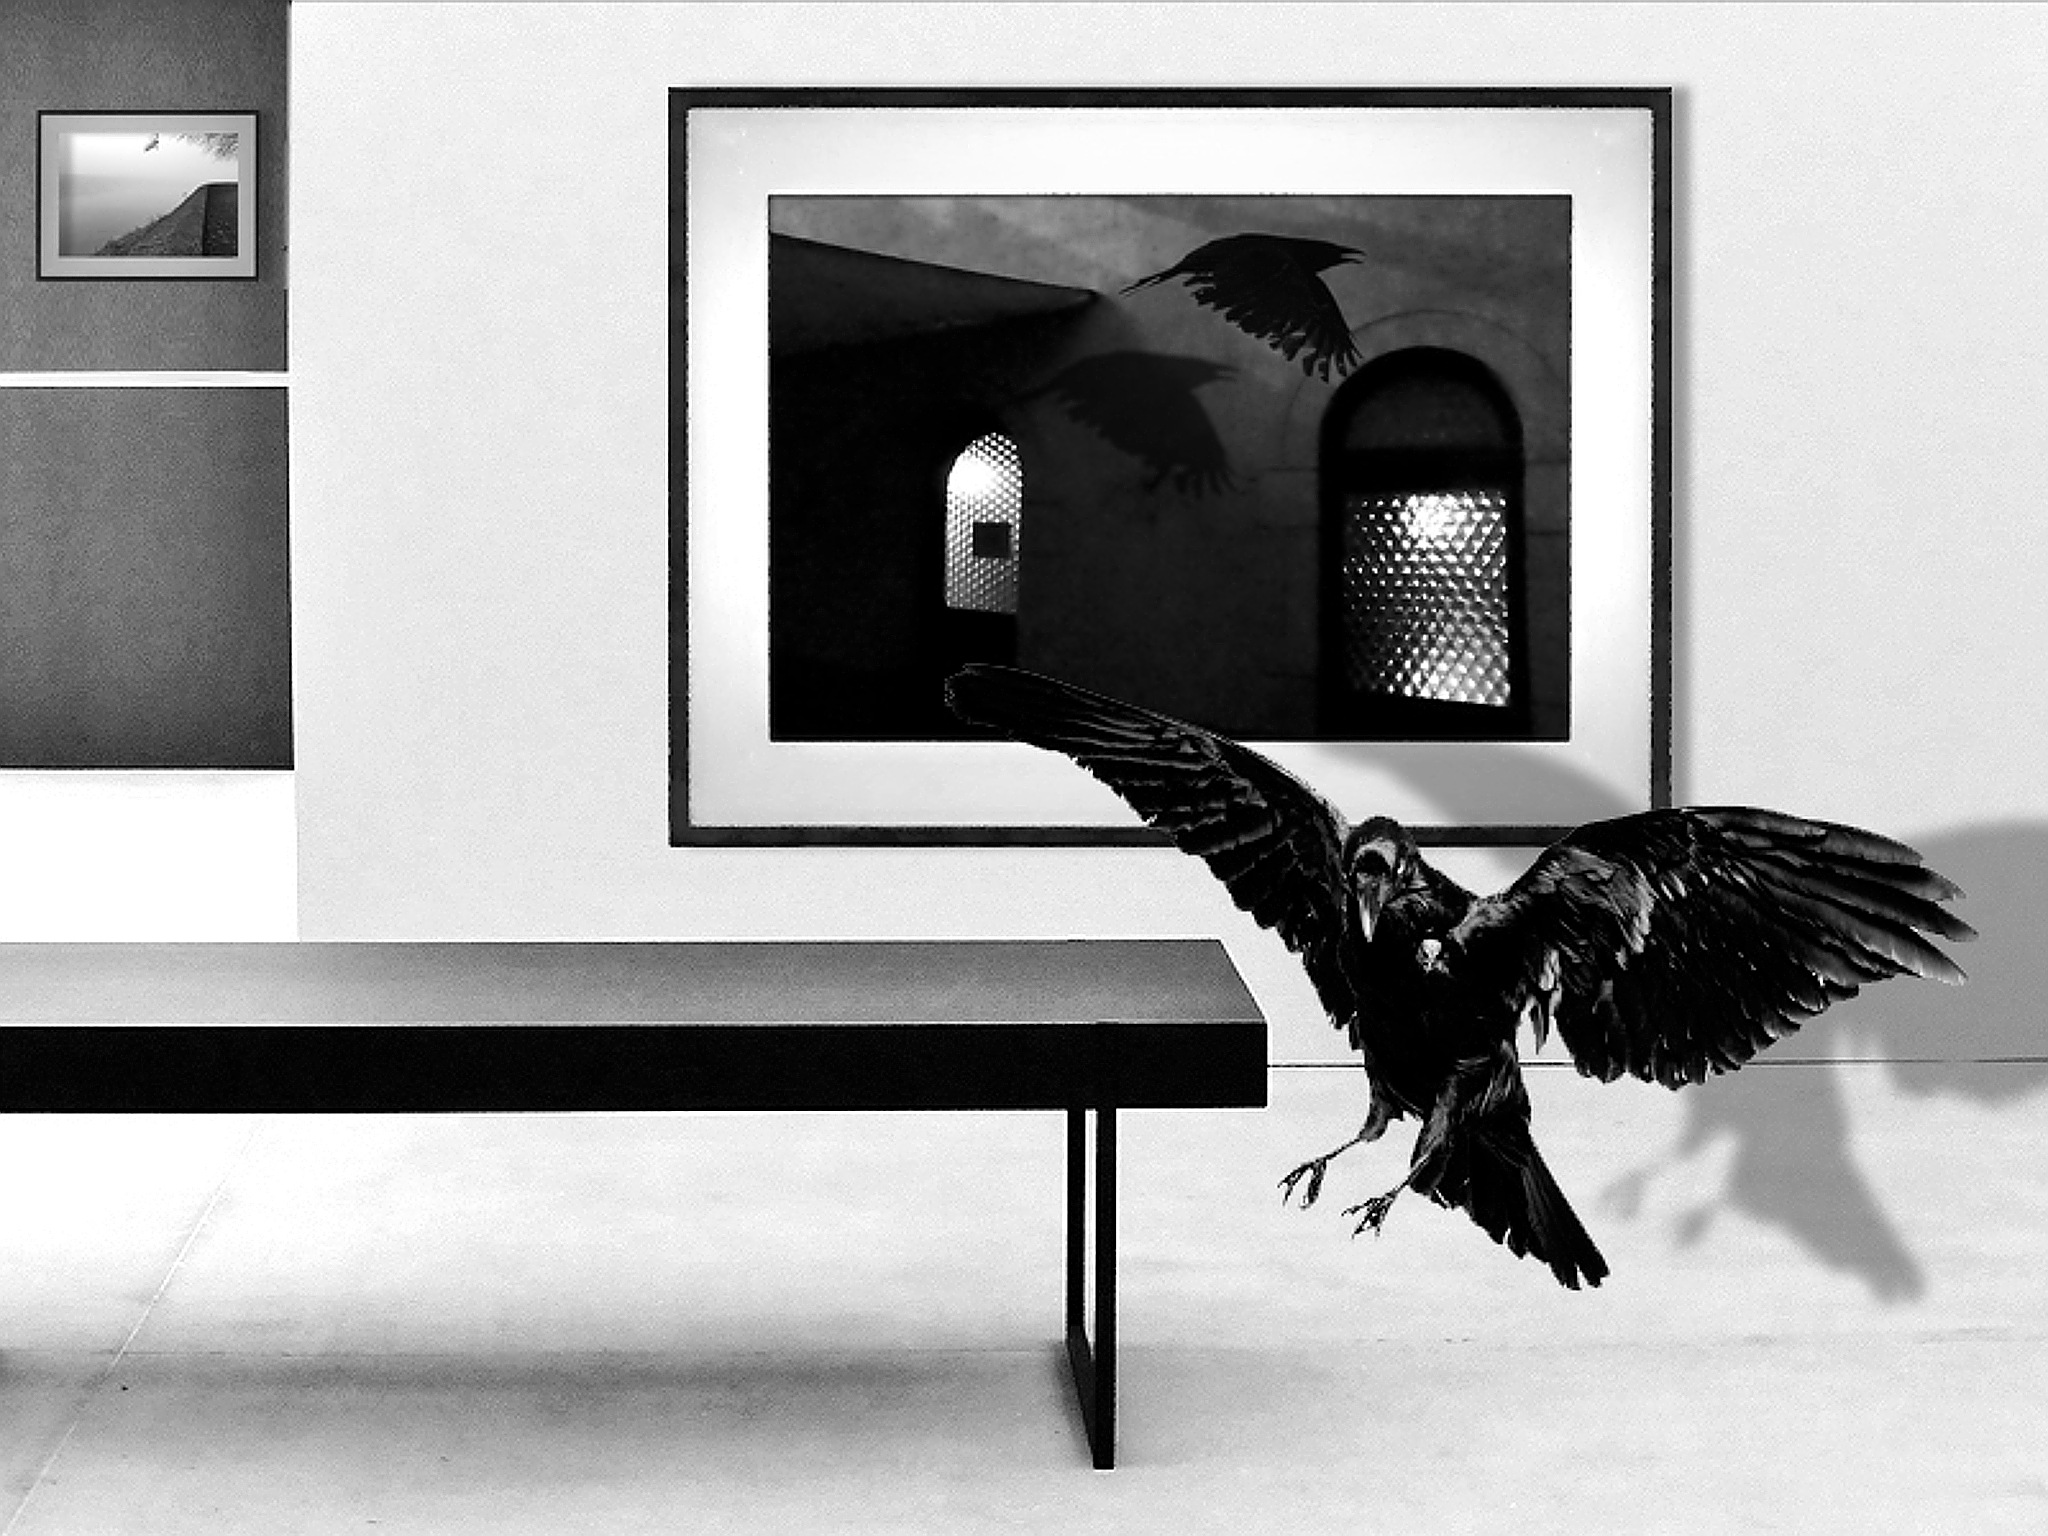 Crows by Gernot Schwarz